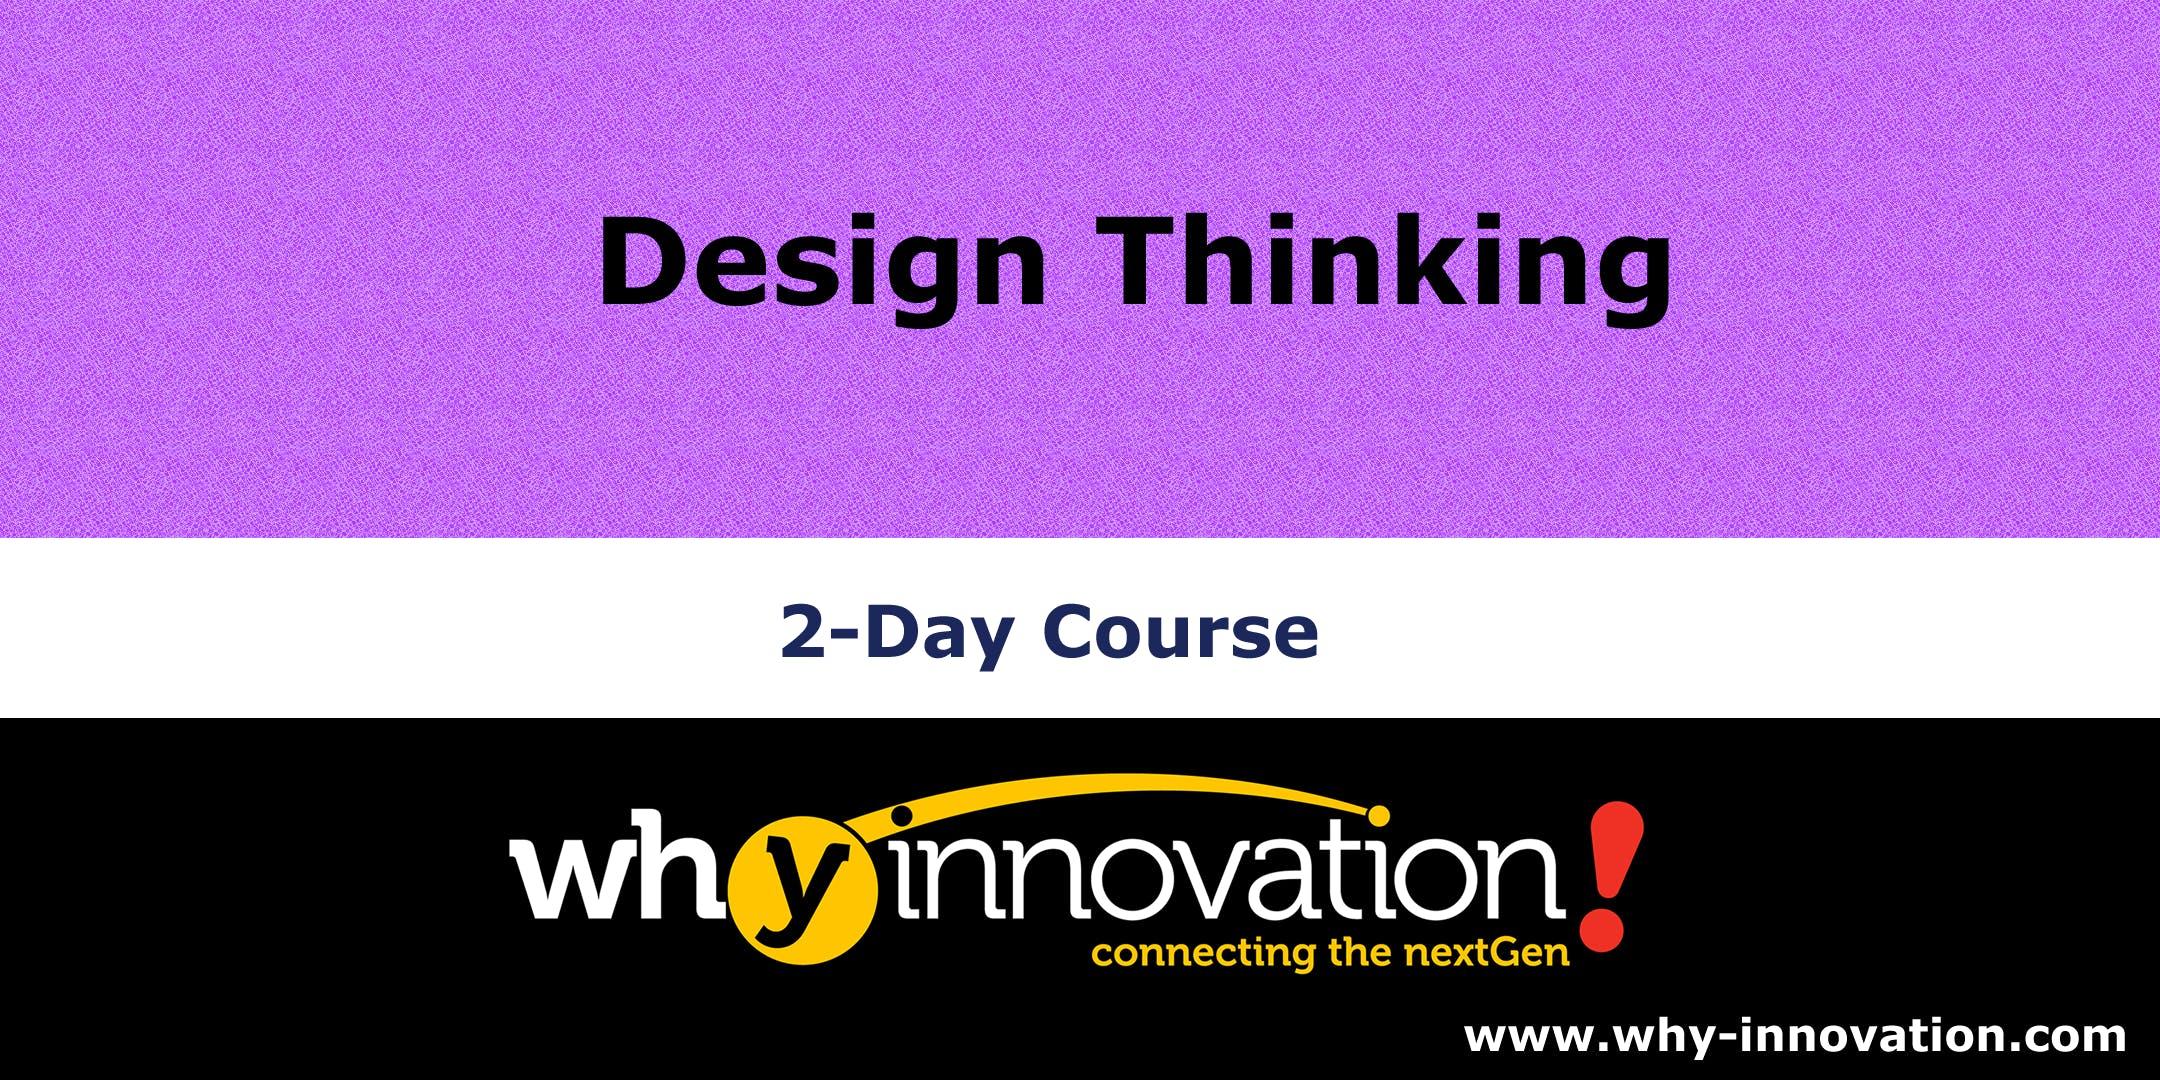 Design Thinking (SG)